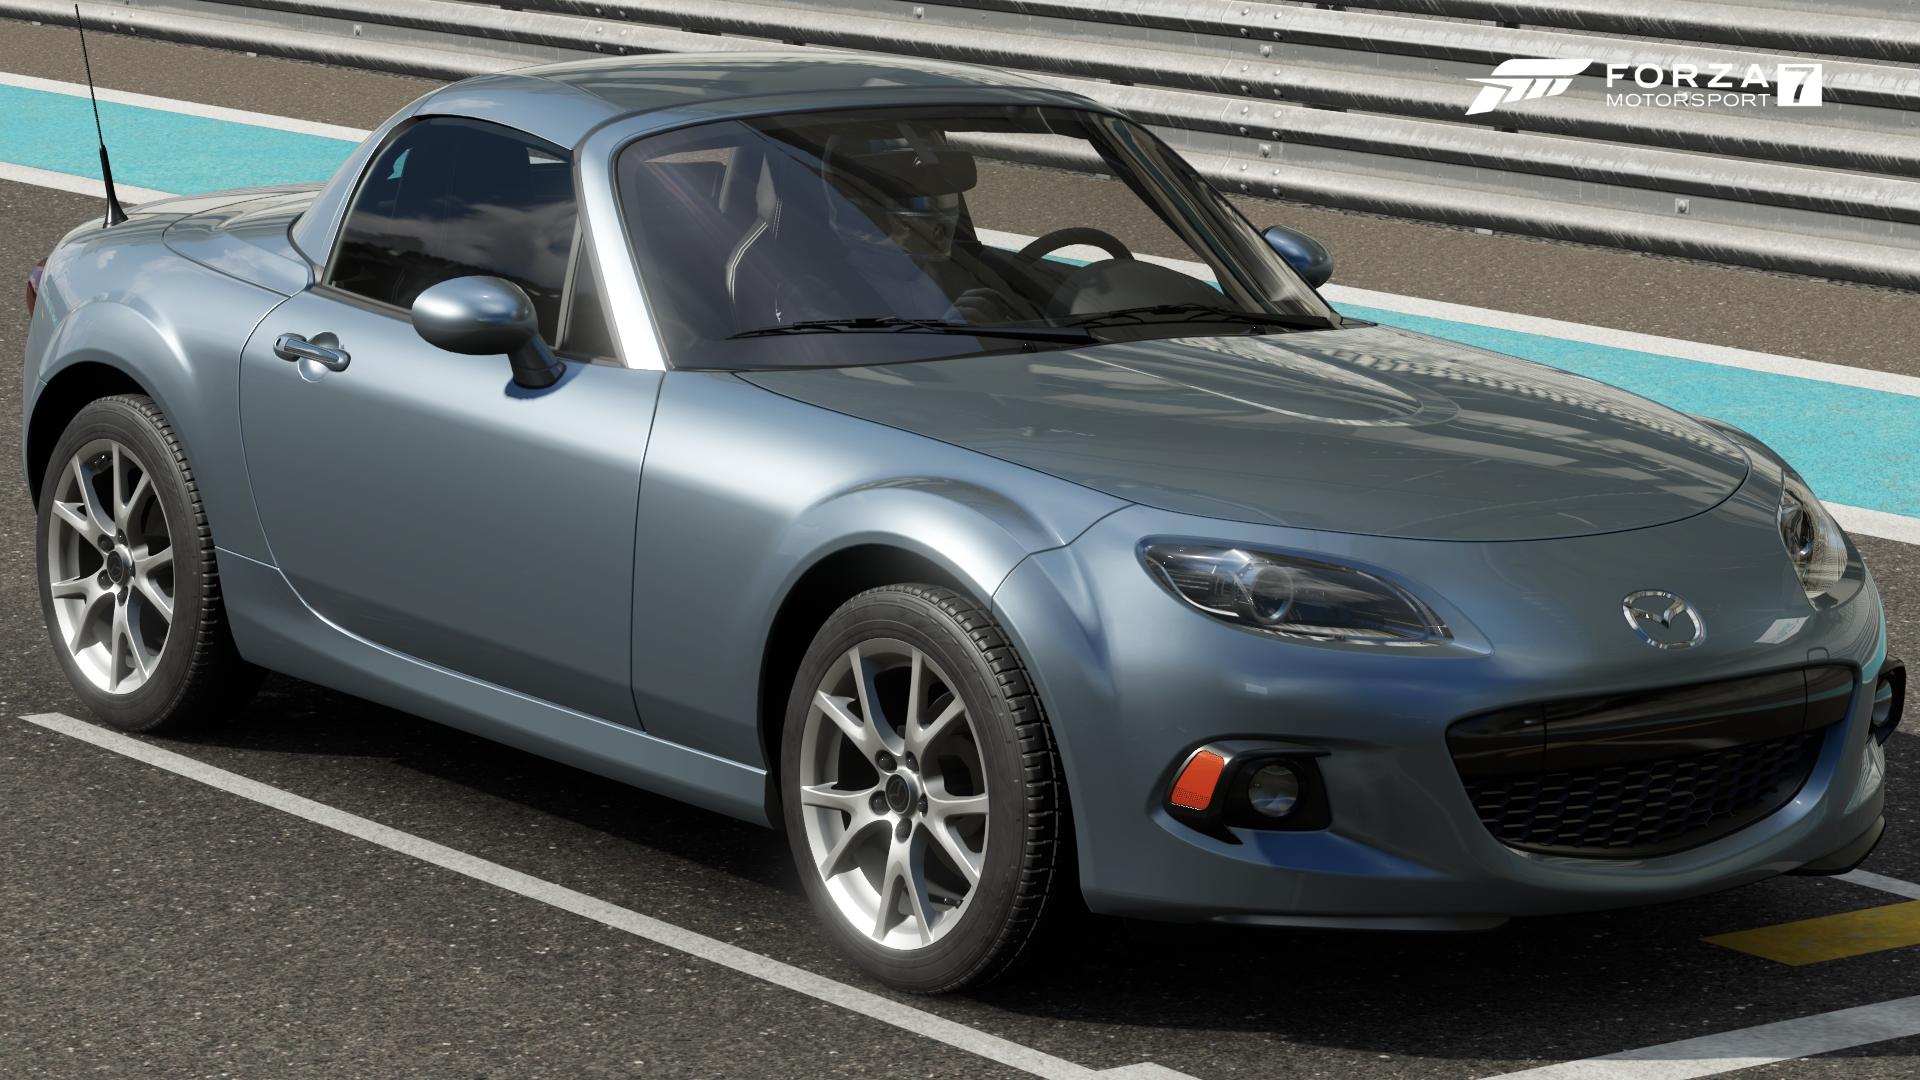 https://vignette.wikia.nocookie.net/forzamotorsport/images/7/7d/FM7_Mazda_MX-5_13_Front.jpg/revision/latest?cb=20171209101922